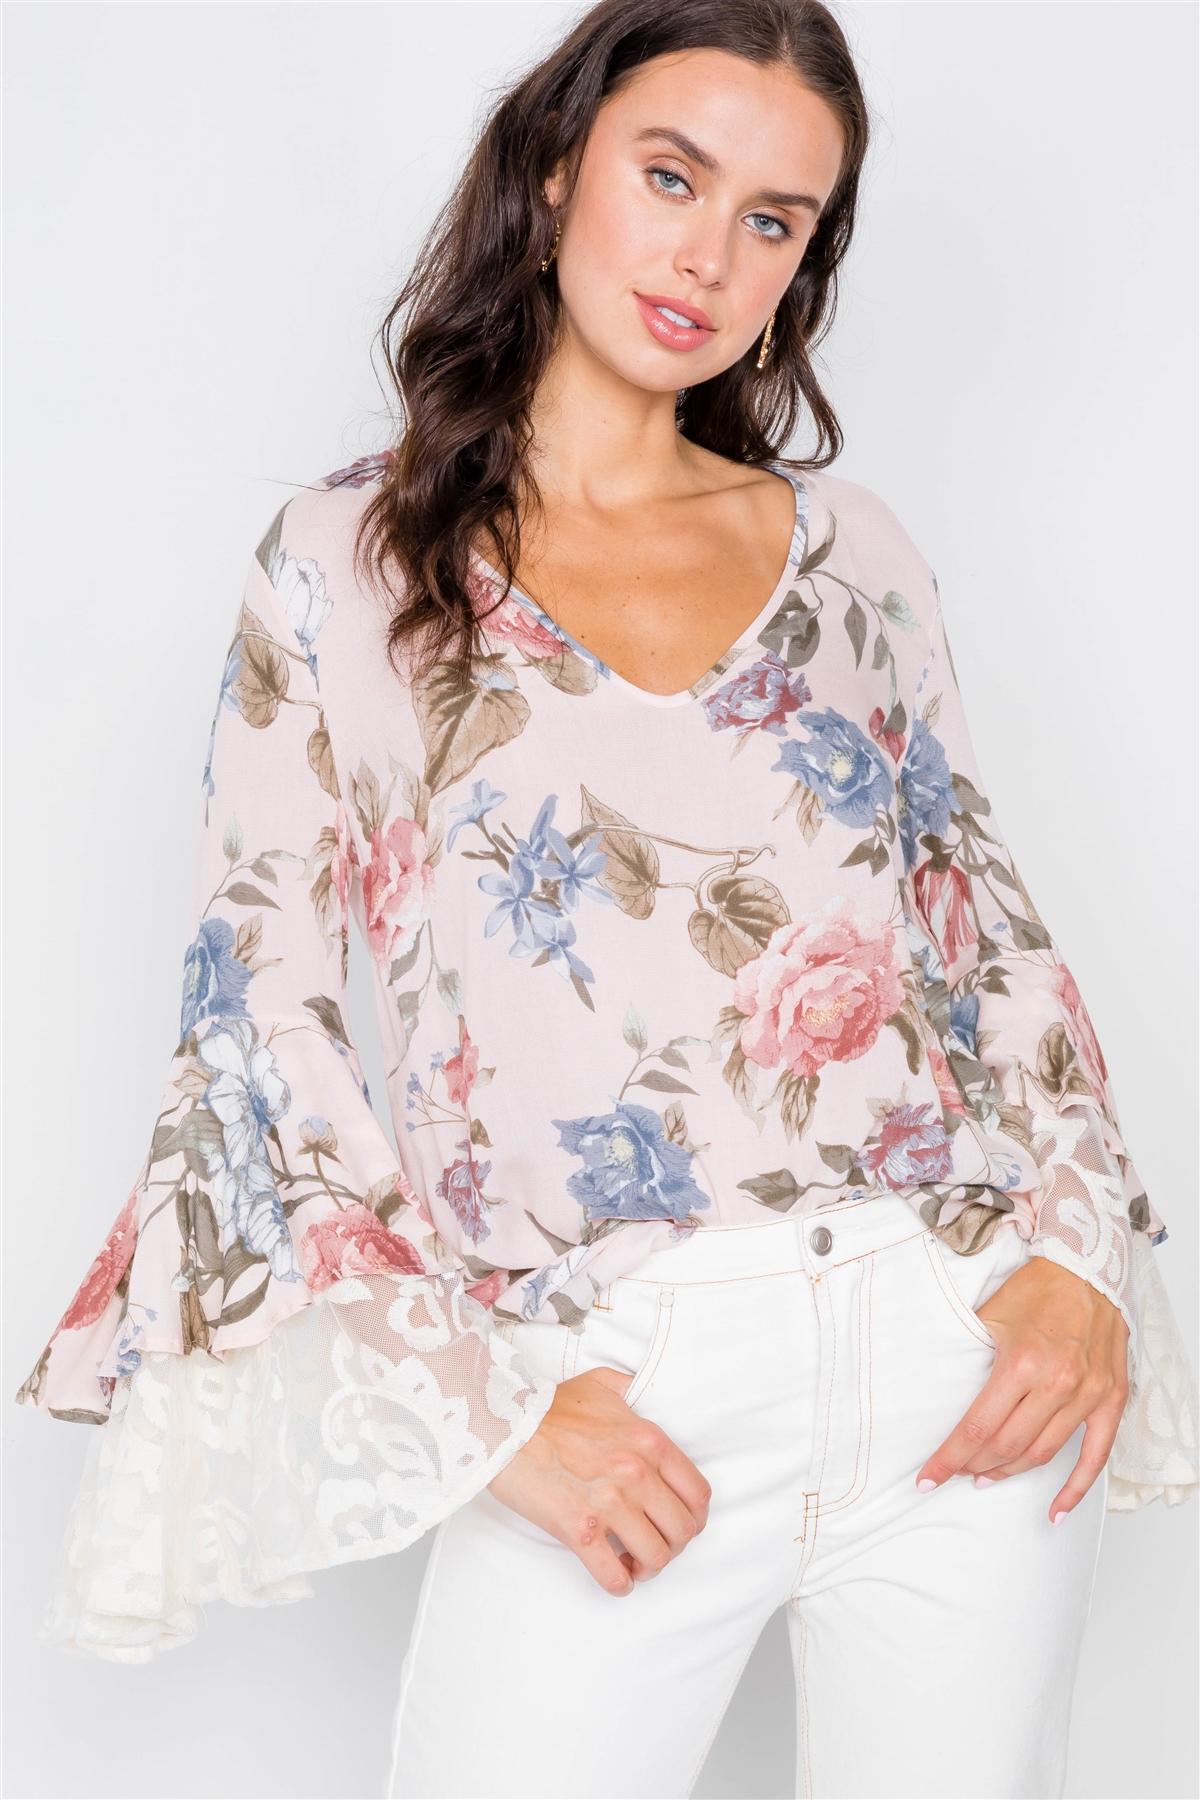 Blush & Floral Print Sheer Layered Trumpet Sleeve Blouse